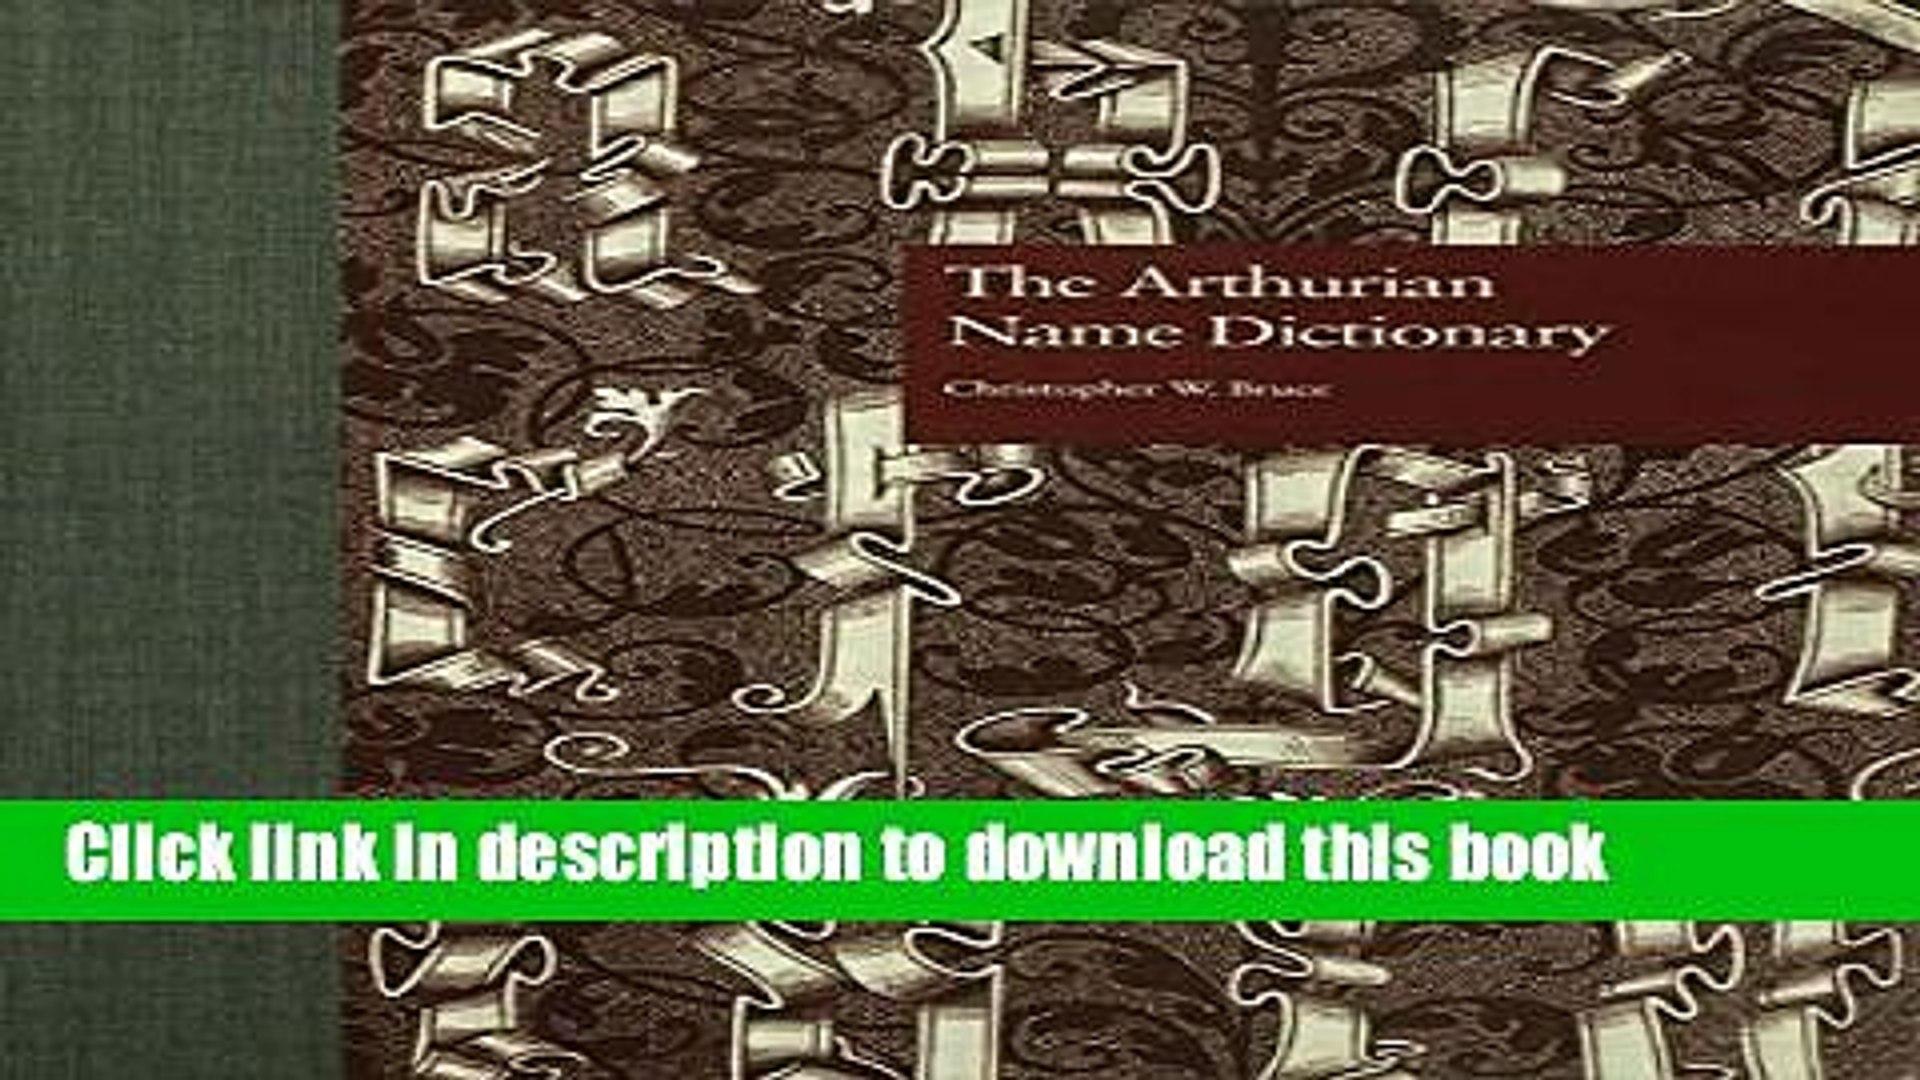 [Popular Books] The Arthurian Name Dictionary Full Online